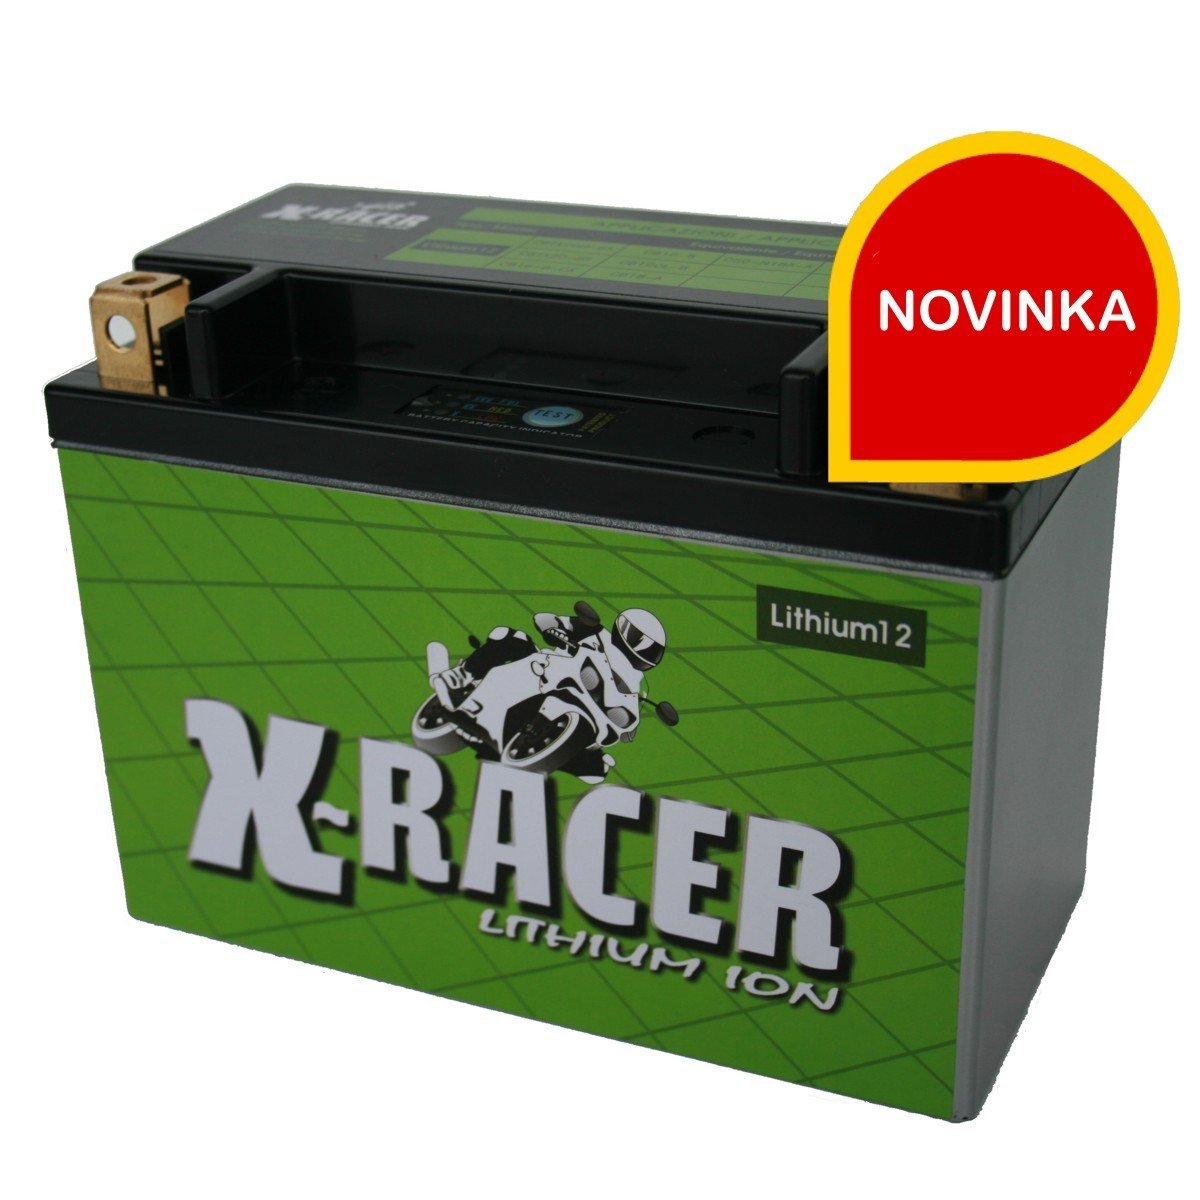 Bezúdržbová motocyklová baterie X-RACER Lithium 12 (12V/24Ah-380A), nahrazuje např. YTX20-BS, YB16-B, YB18-A a Y50-N18A-A...